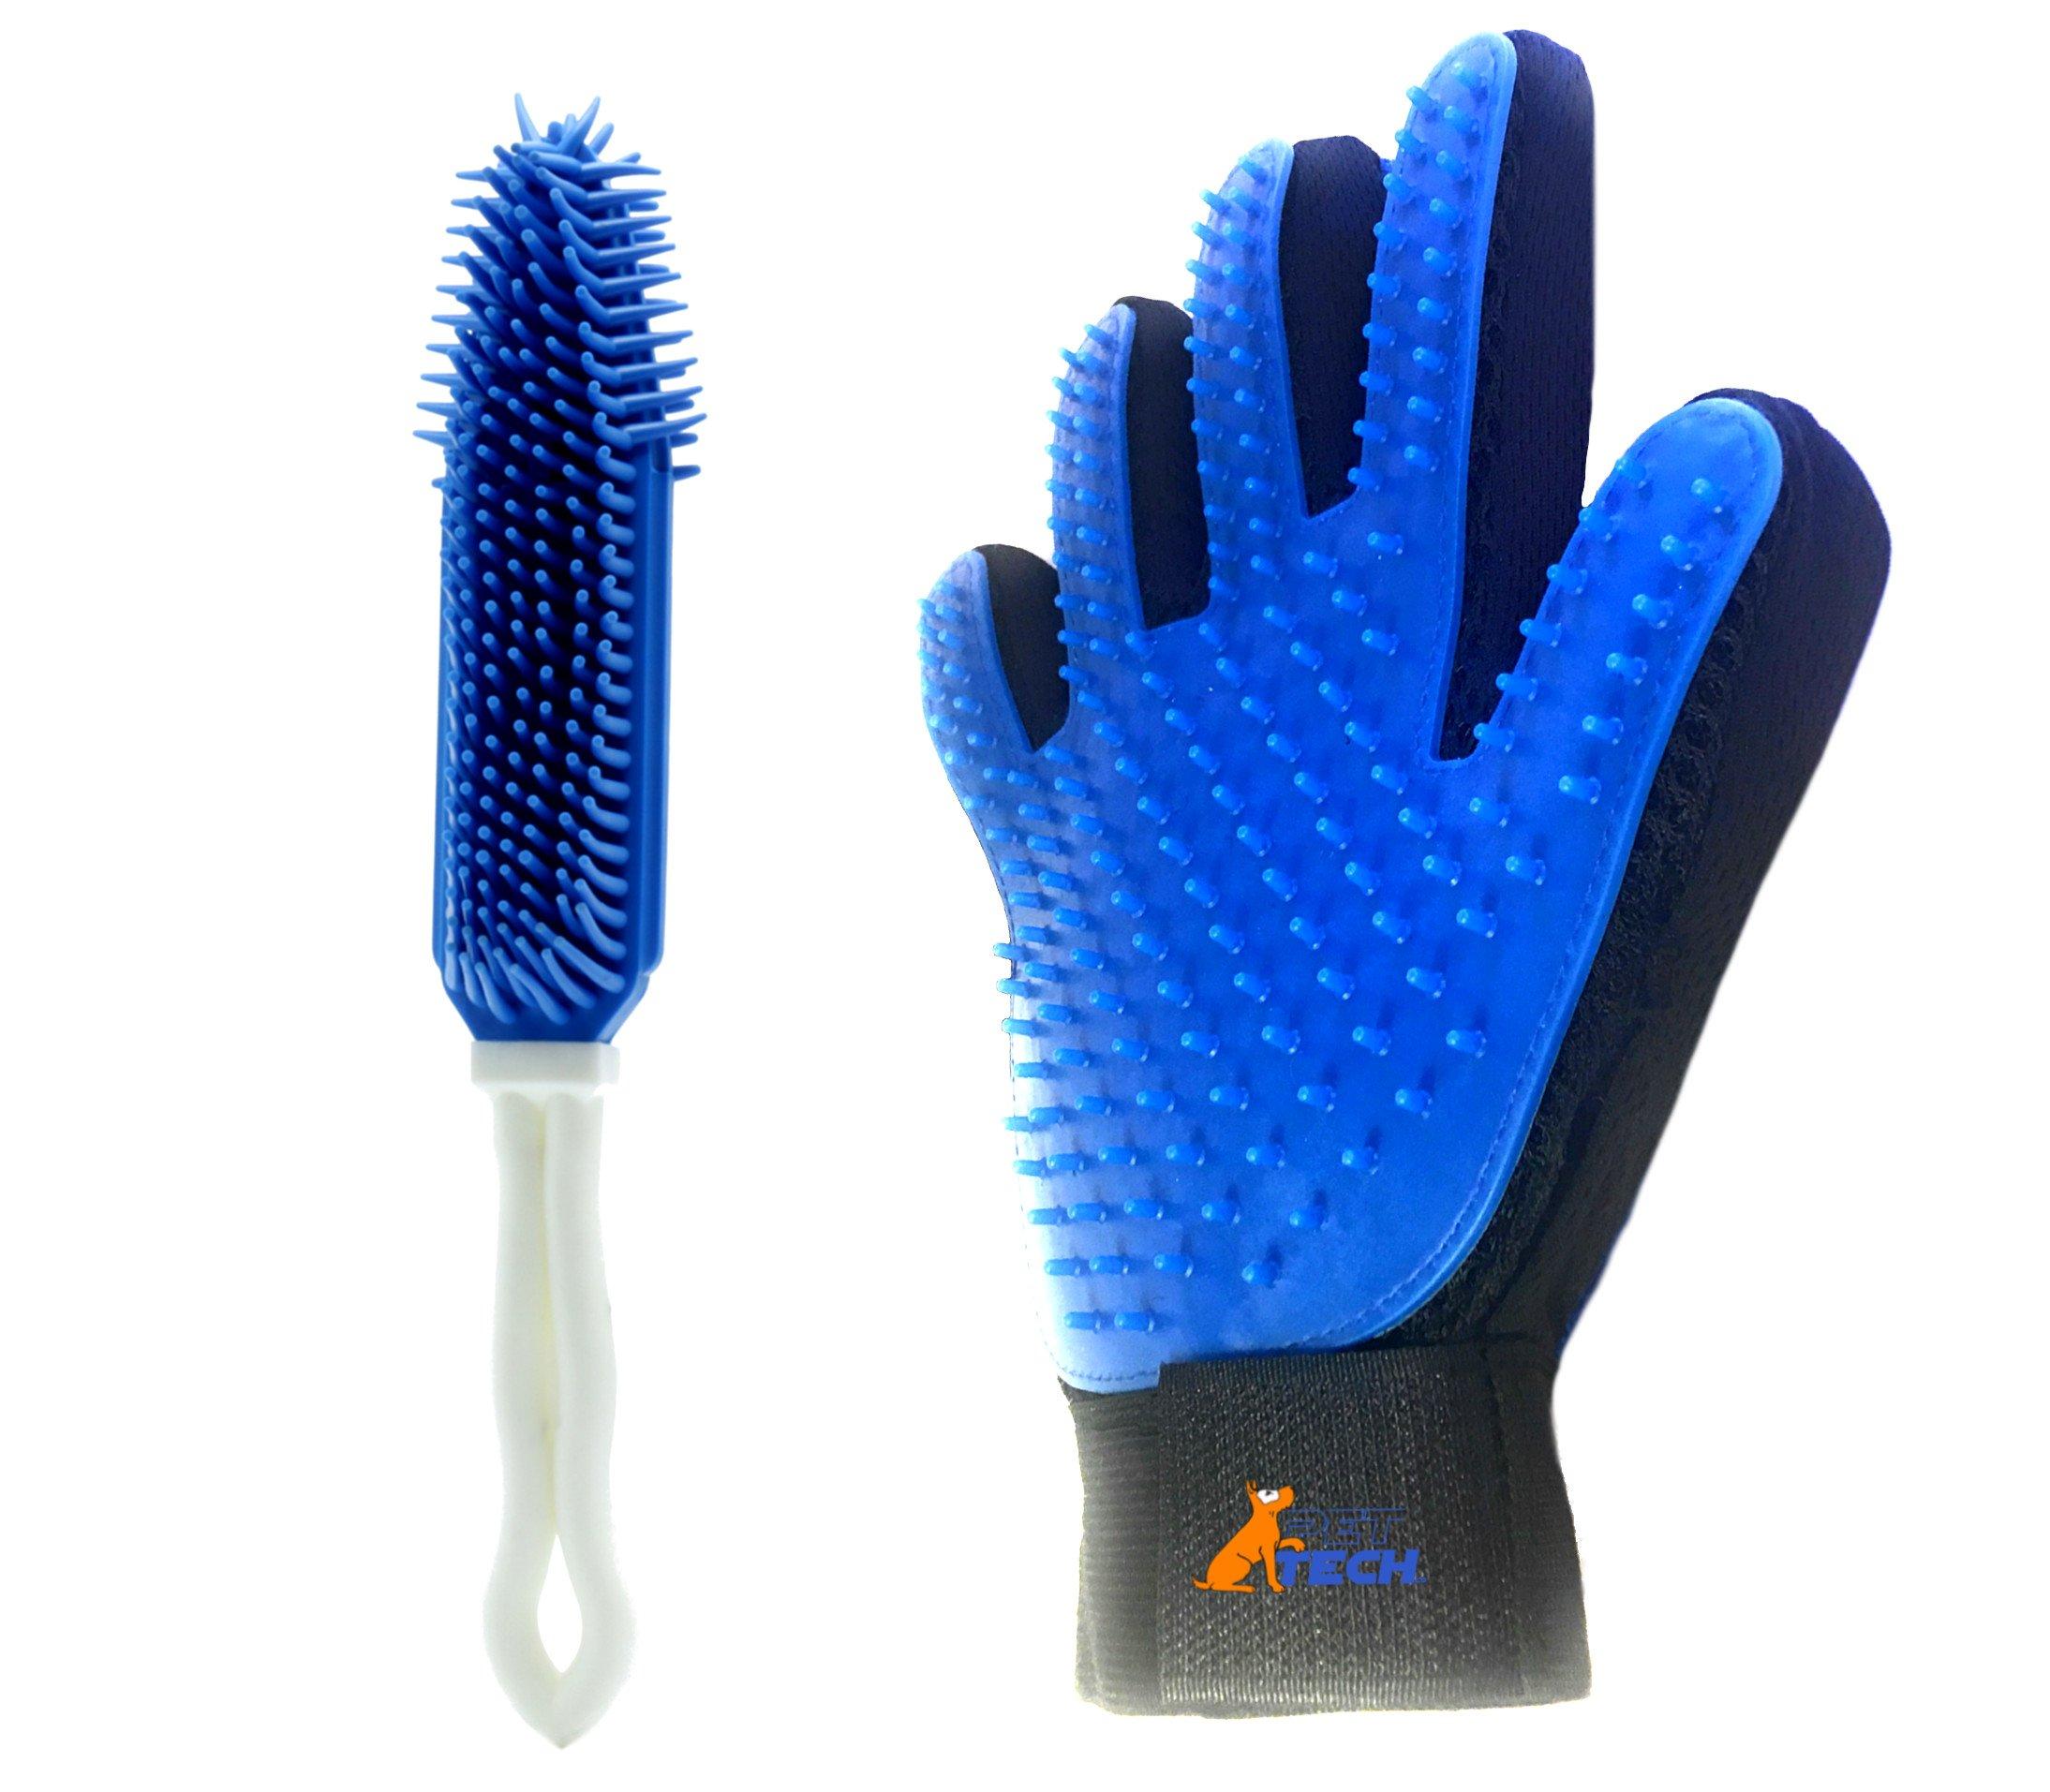 Pet Hair Remover DeShedding Glove for Cats - Dog Grooming Kit - Shedding Hand Mitt - Dog Washing Mitt - Lint Fur Furniture Tool - Long Medium Coat - Animal Hair Remover Brush Kit Bundle